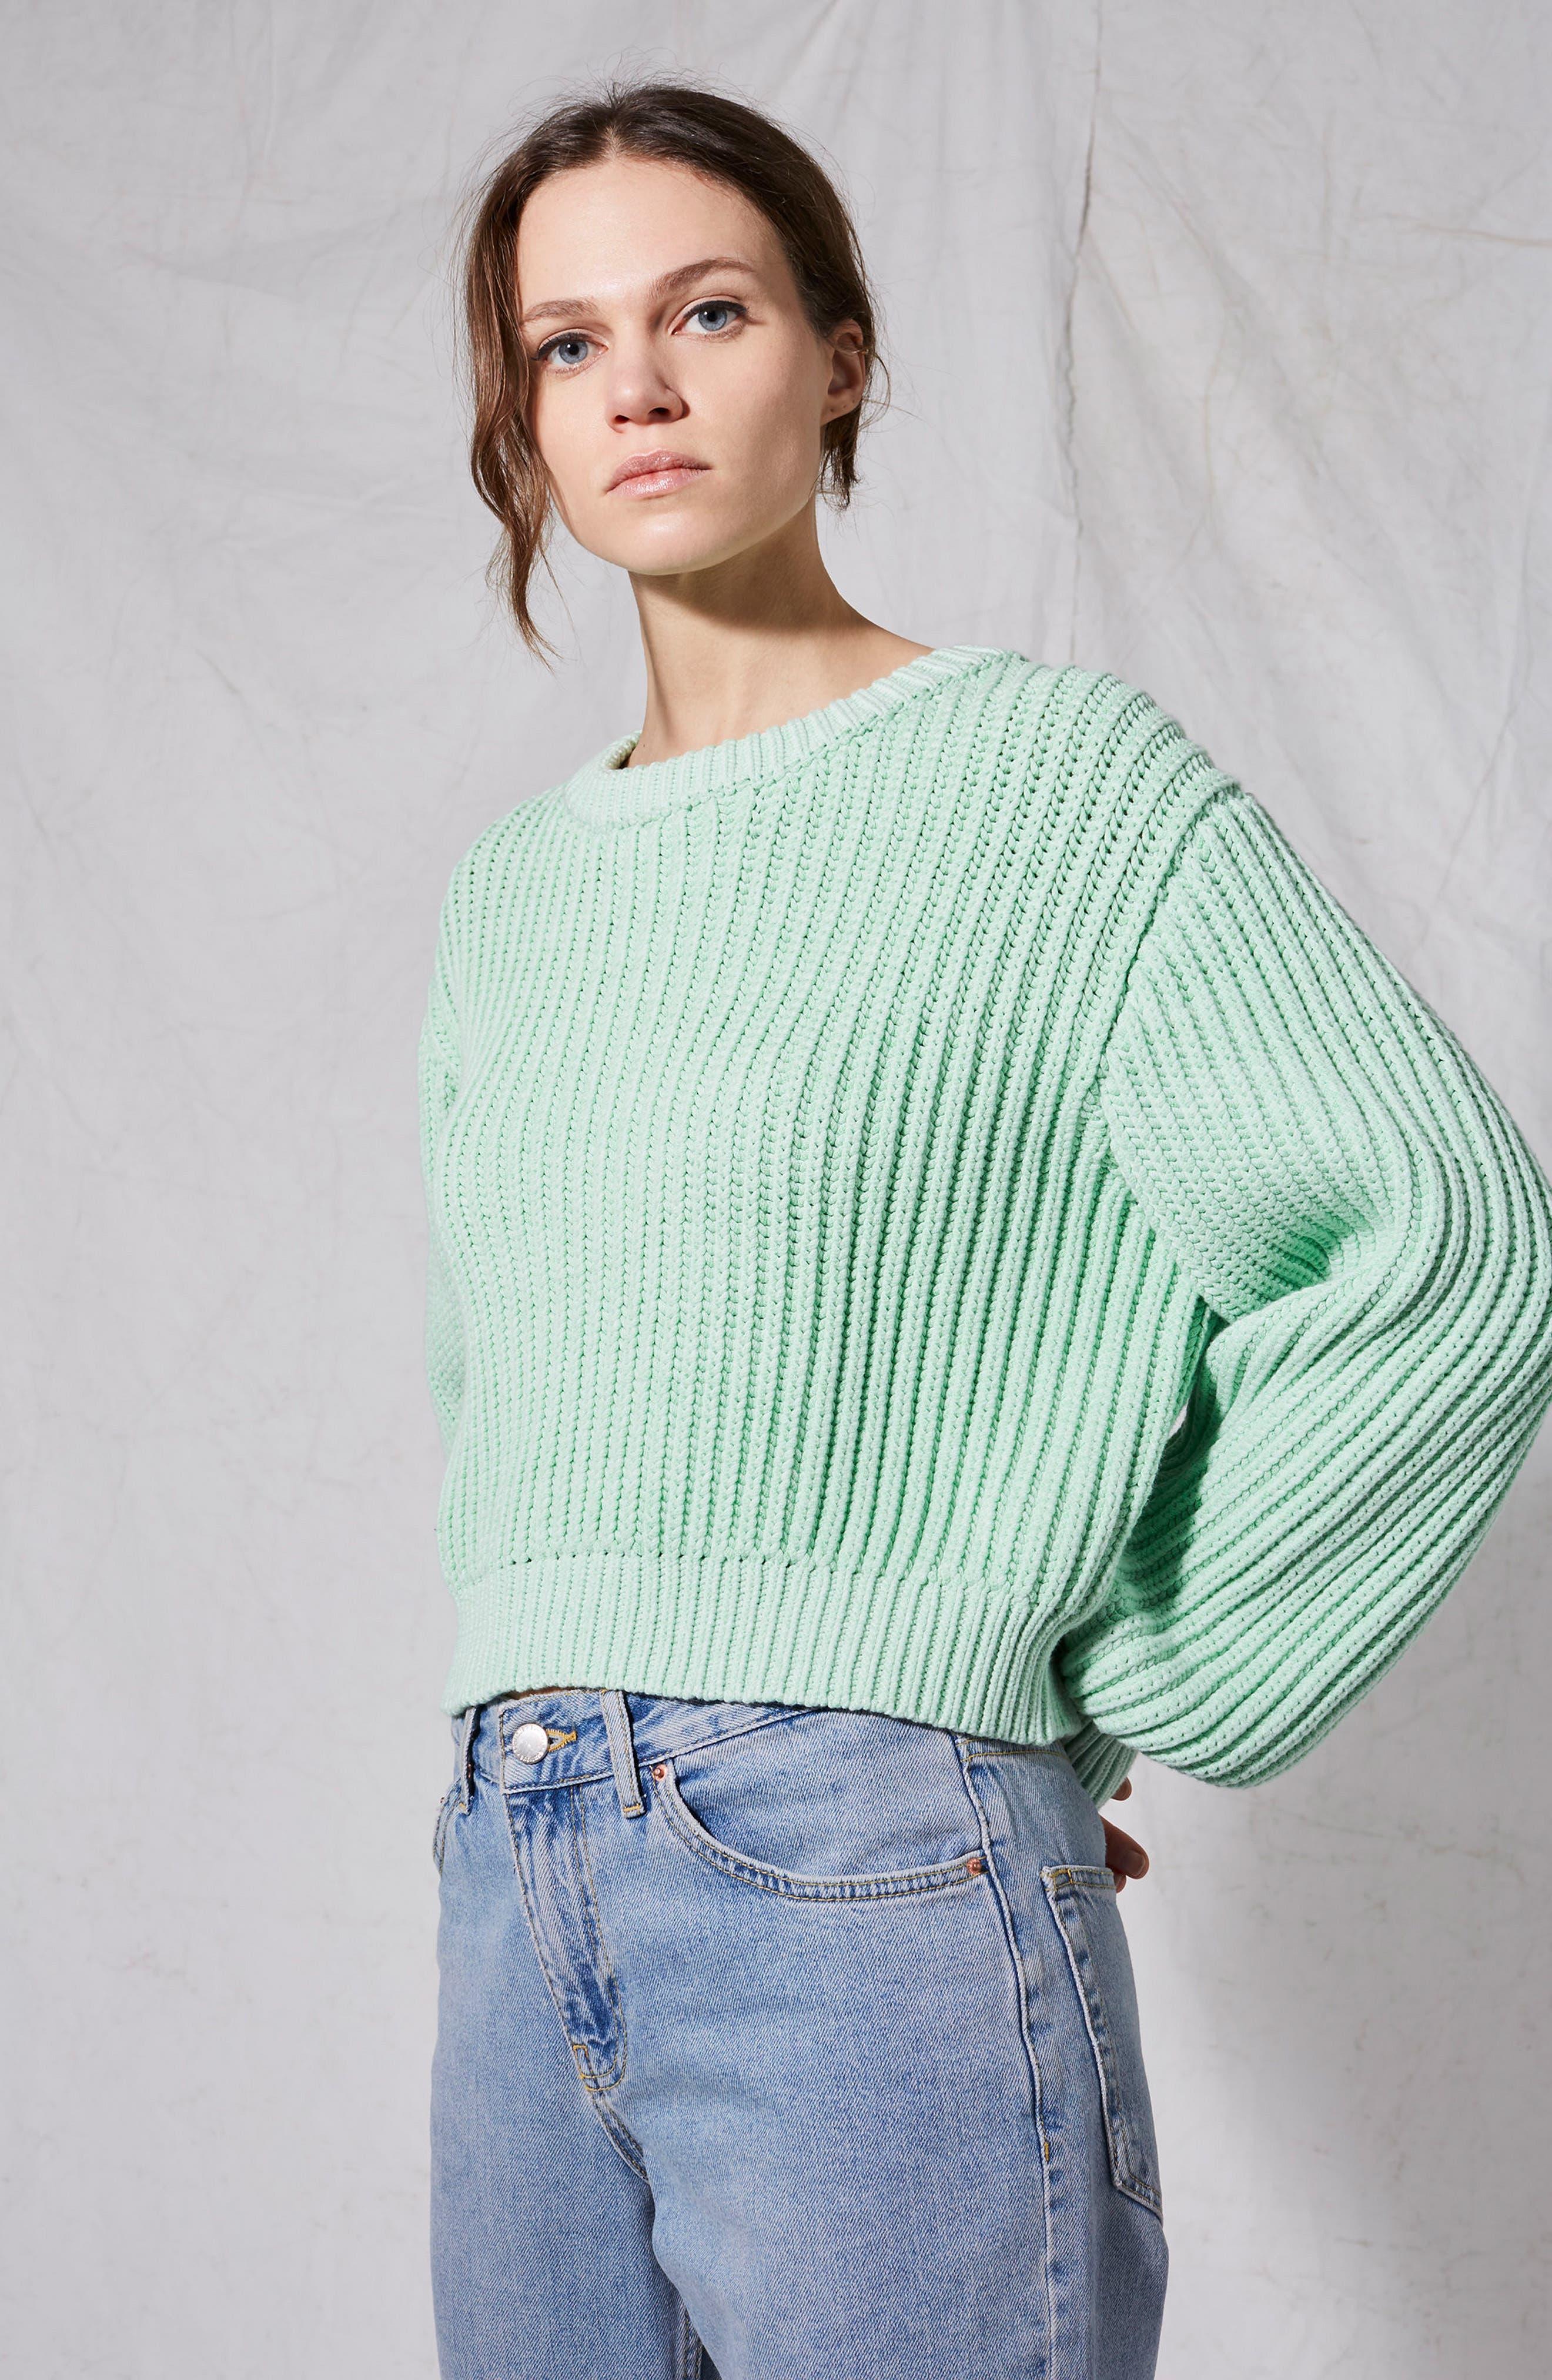 Fisherman Crewneck Sweater,                             Alternate thumbnail 3, color,                             Light Green